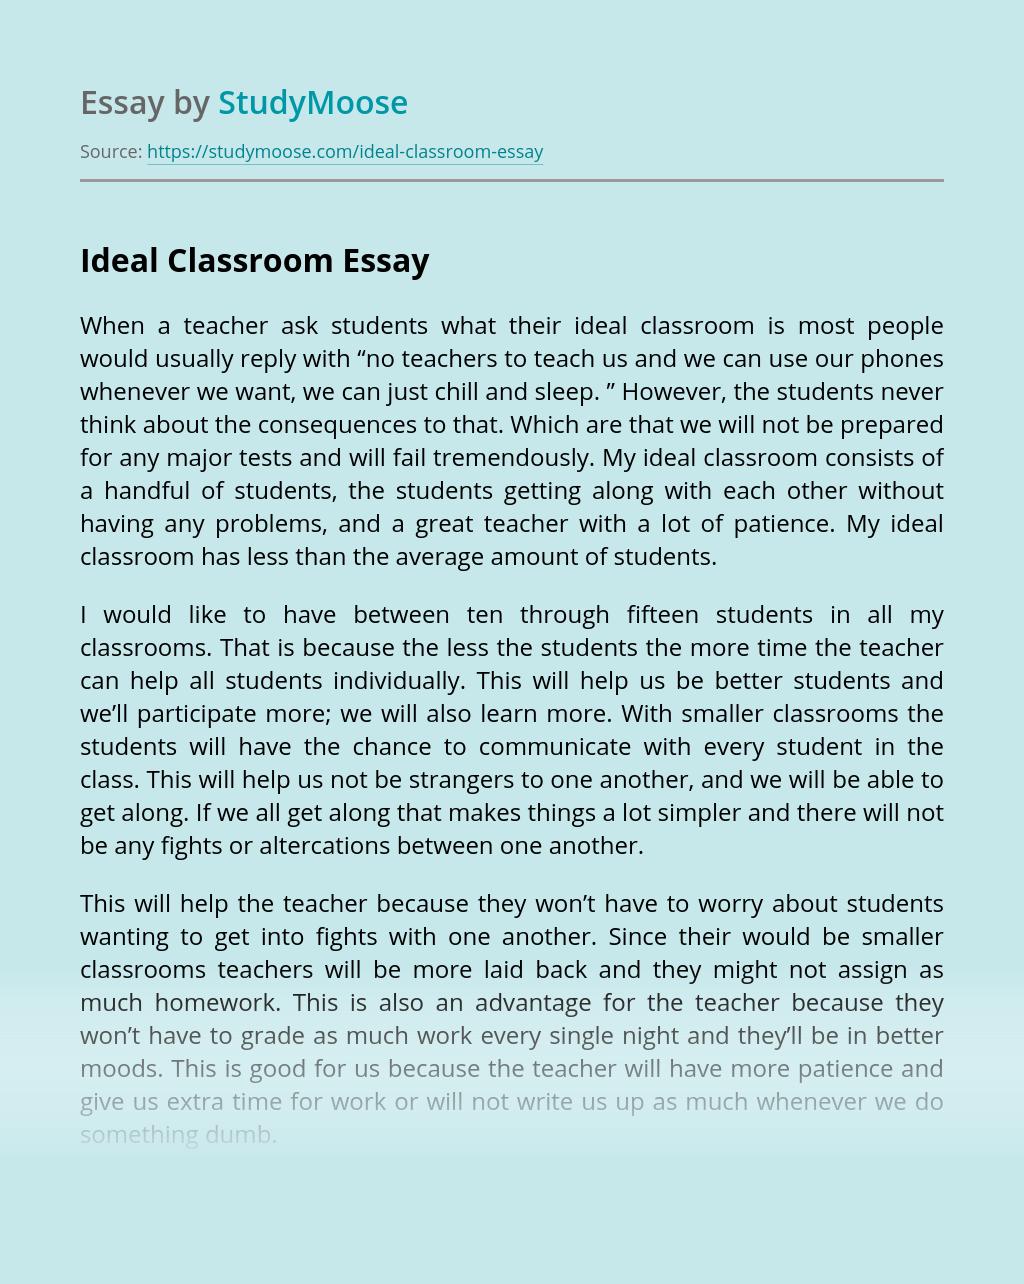 Ideal Classroom